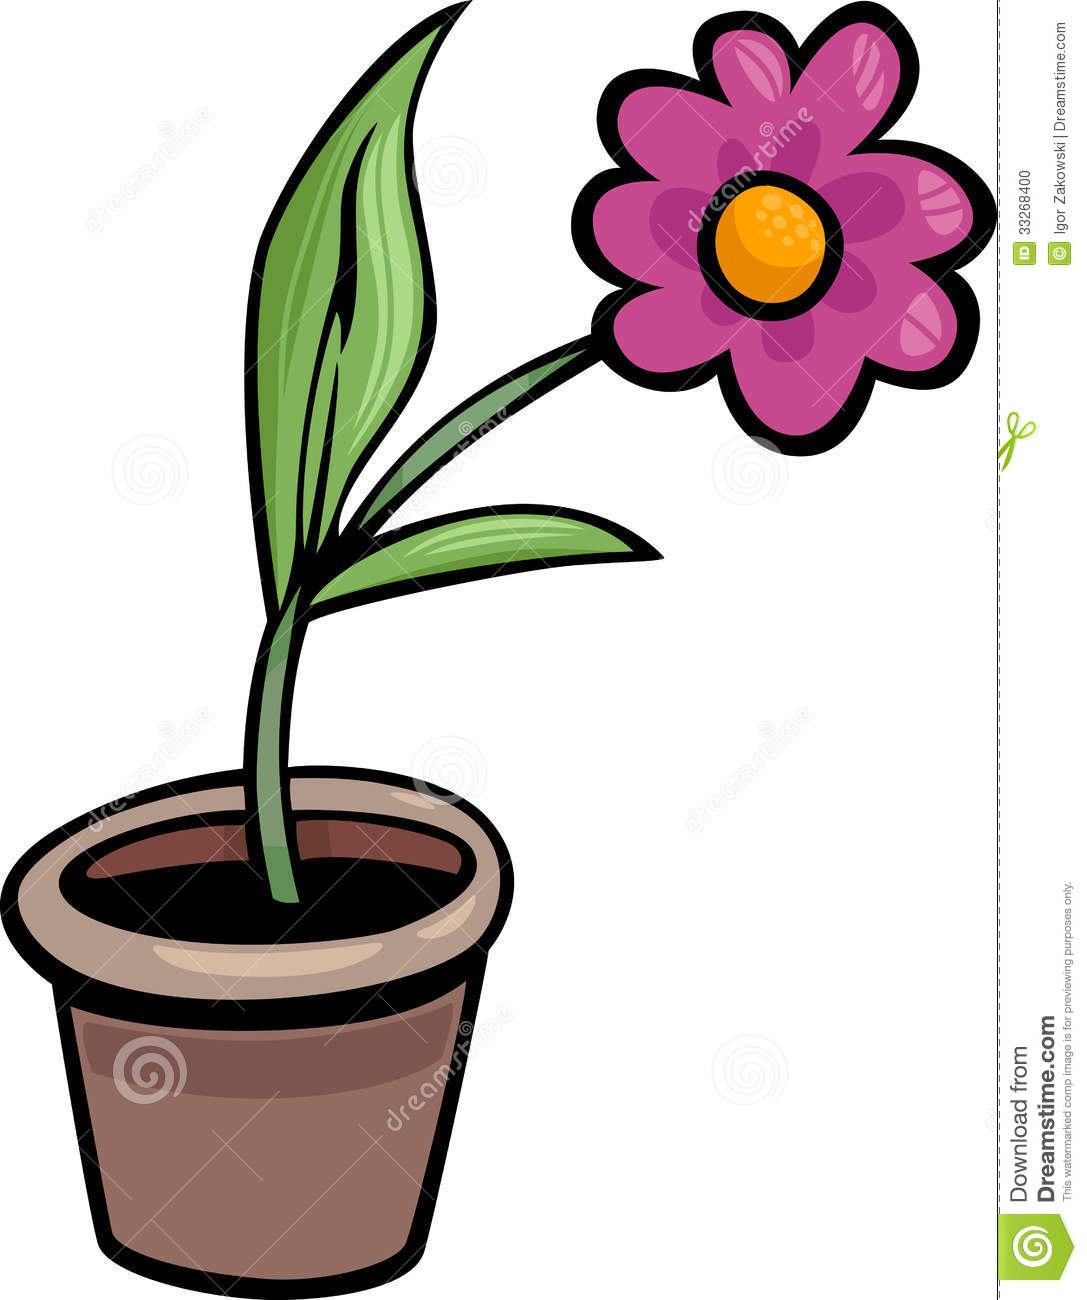 Cartoon Flower Pot to Pin on Pinterest PinsDaddy